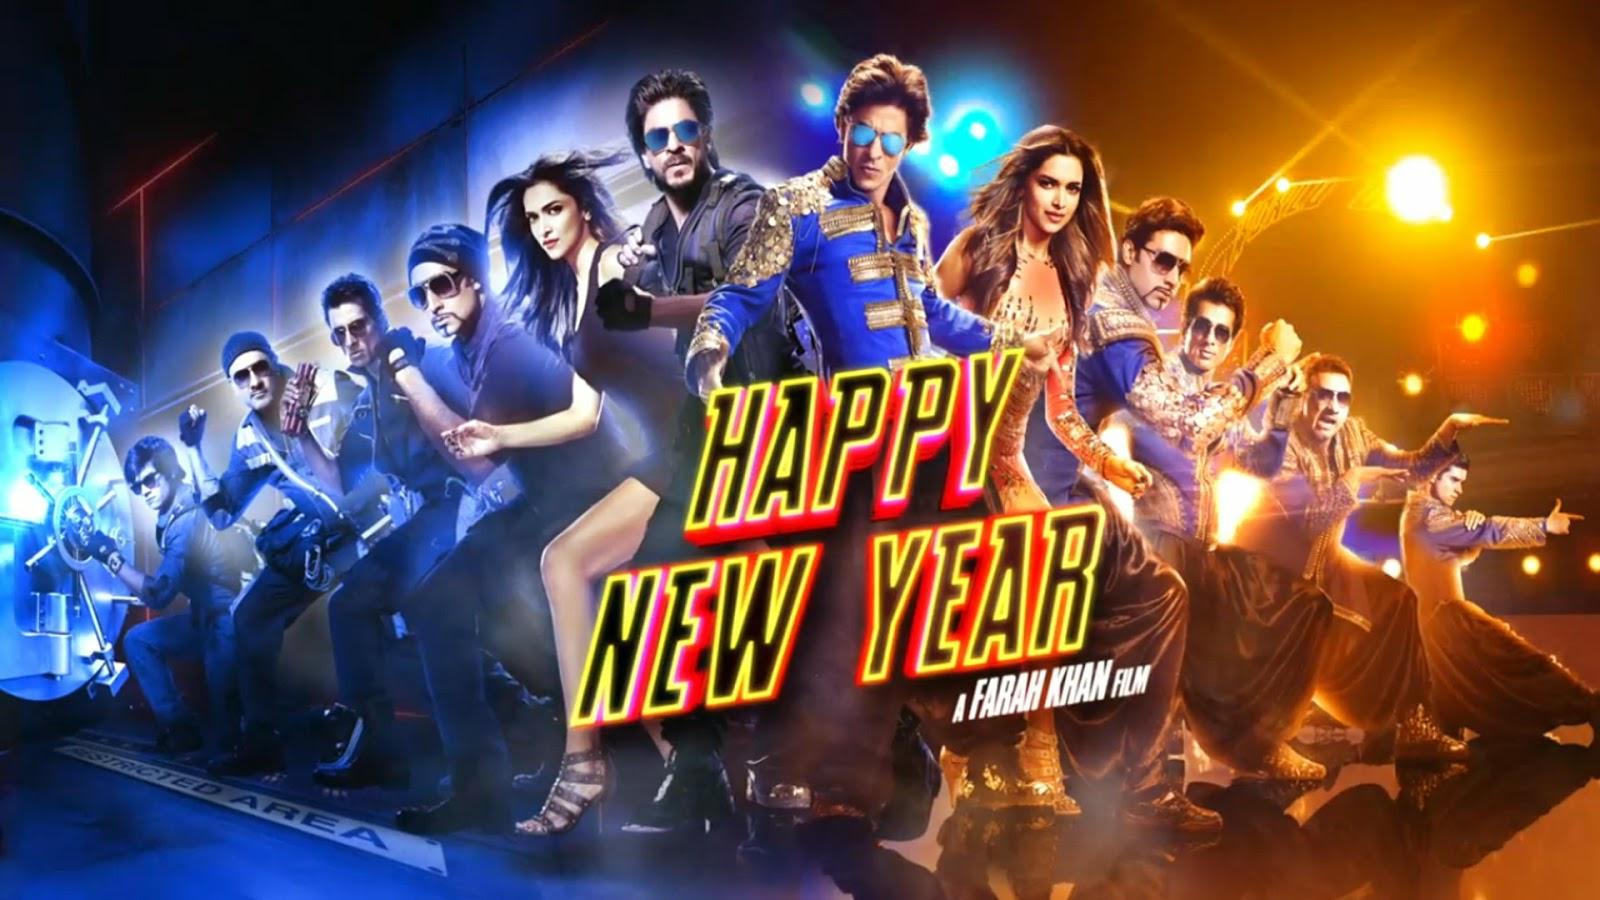 Happy New Year Movie 2014 Watch - 219.9KB